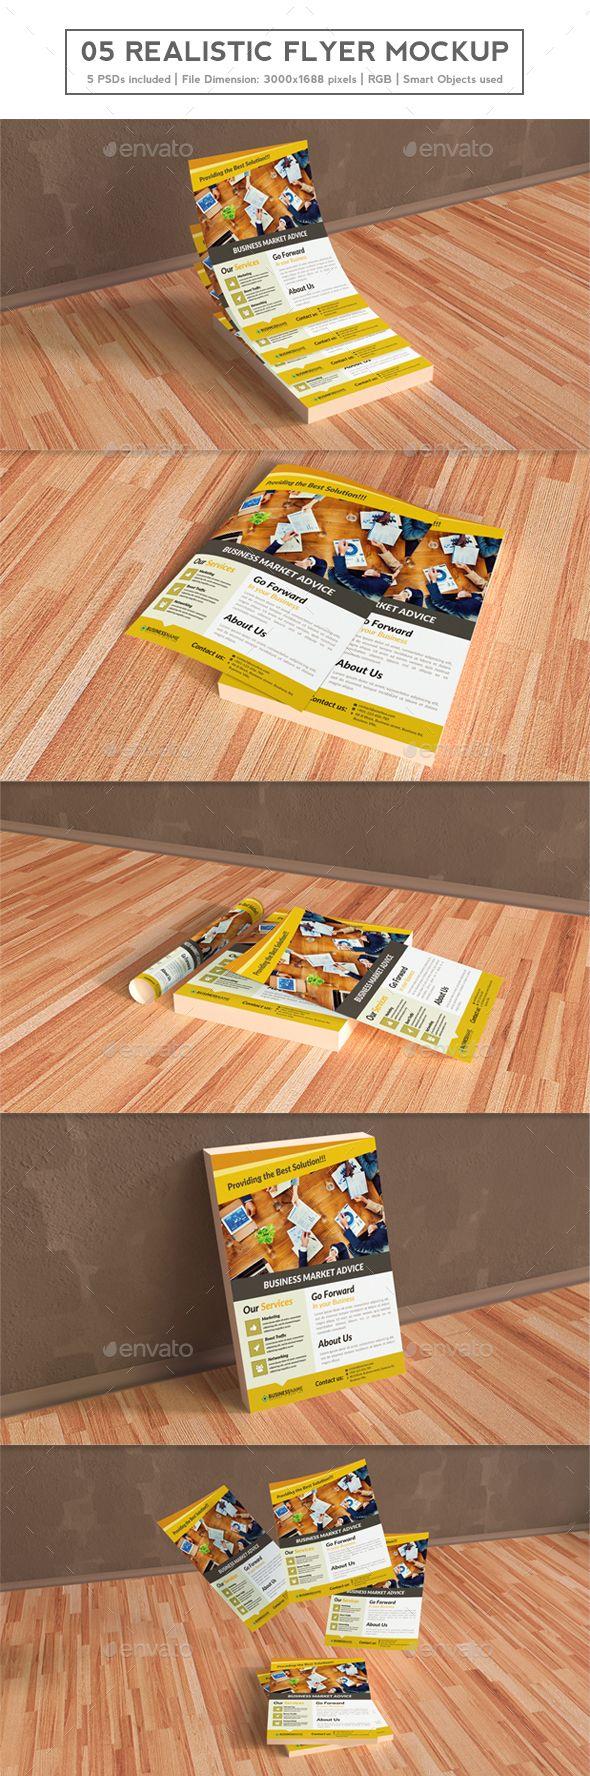 Print Mockup - Realistic Flyer Mockups - Print Mockup by hikaa.  #Graphic #TuesdayMotivation #WebElements #TuesdayThoughts #TuesdayWisdom #Logo #UserInterface  #UIUX #BlackFriday #CyberMonday #HappyTuesday #PresentationTemplate#TuesdayFeeling #DesignTemplate #Vectors